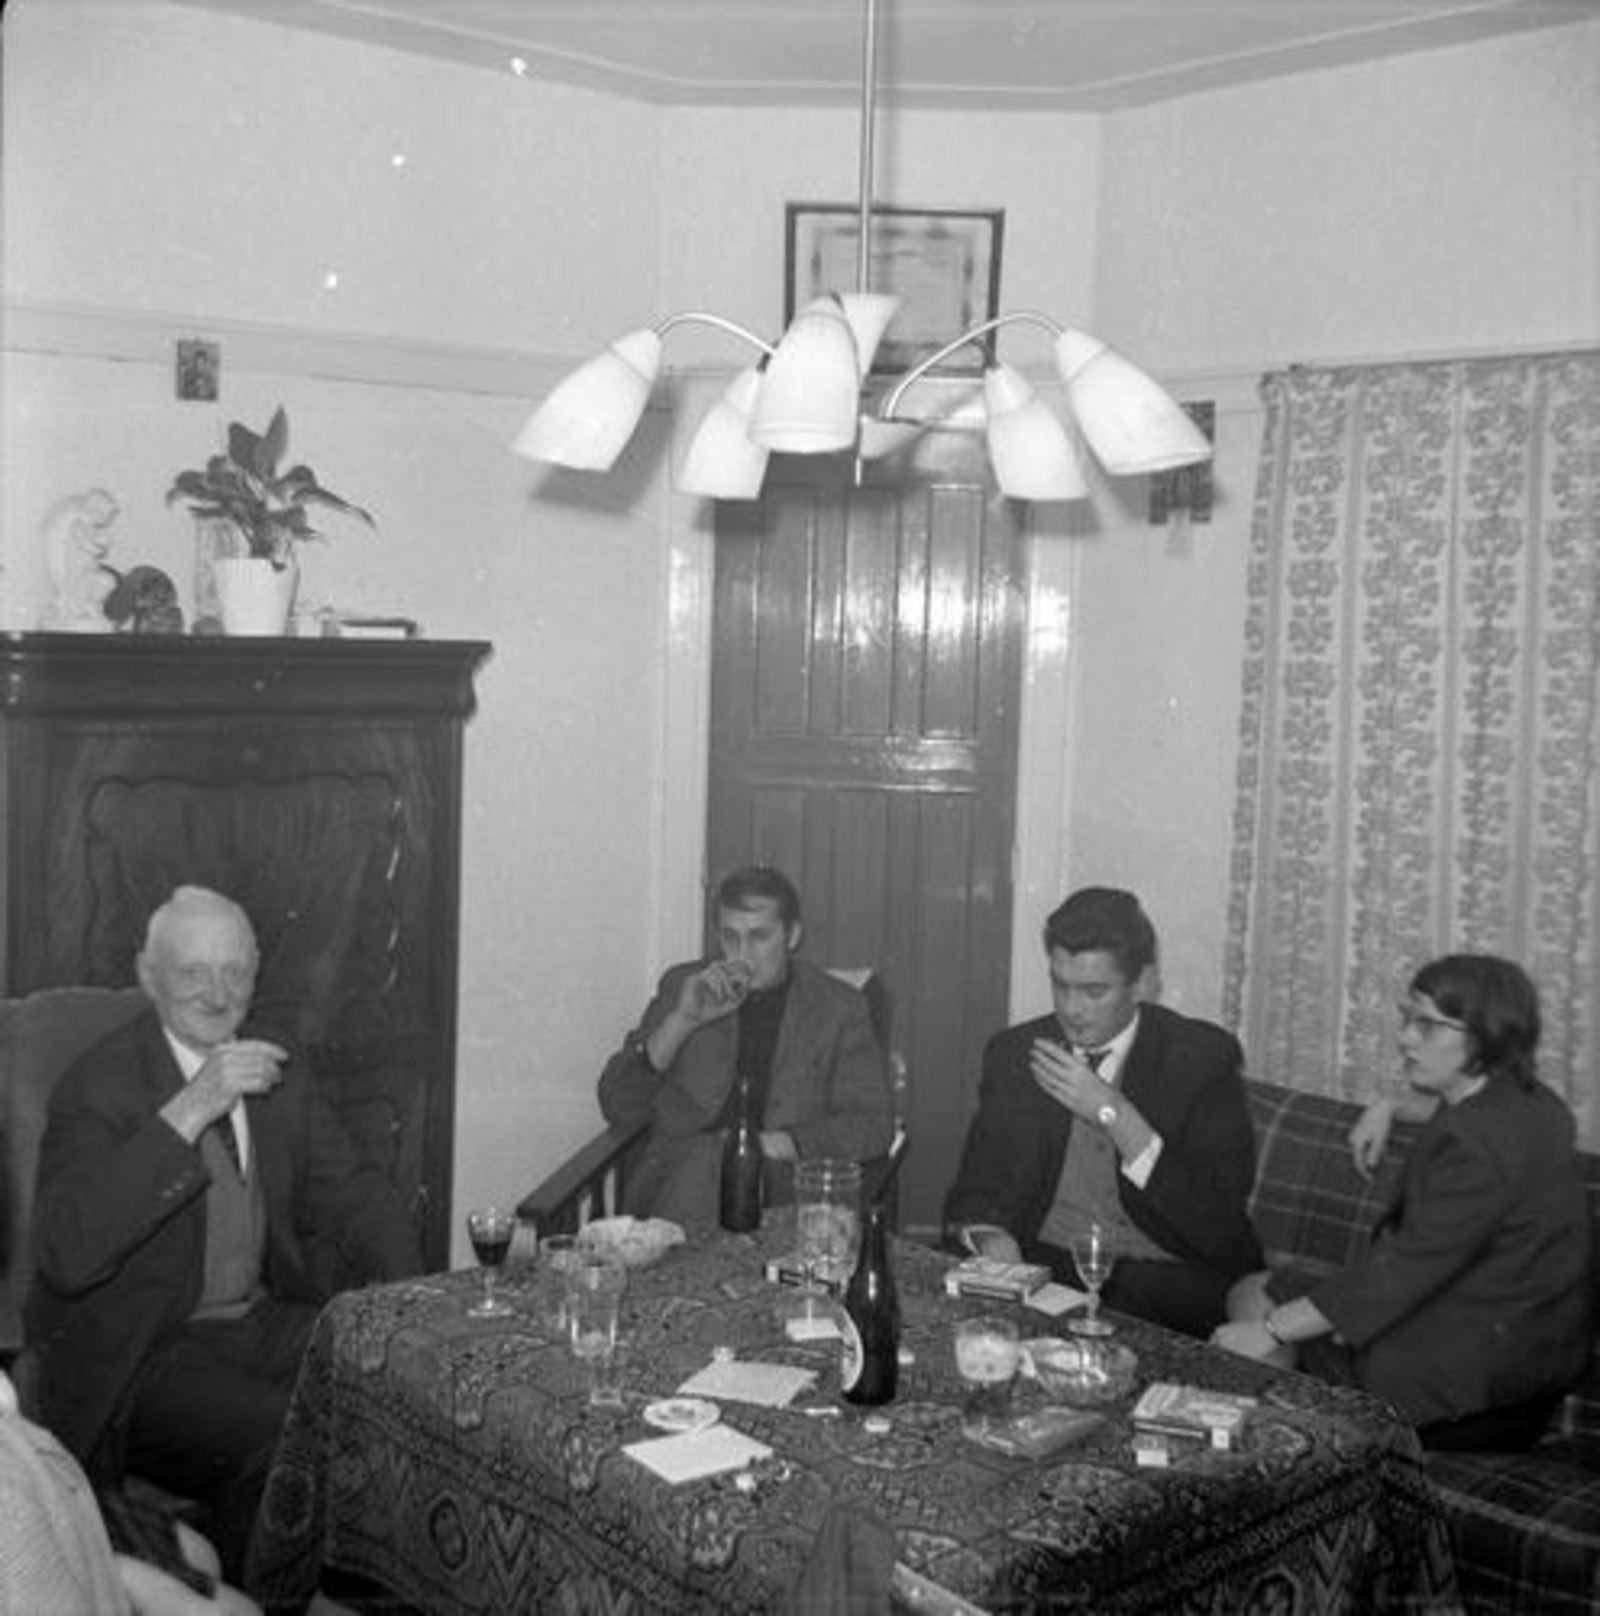 Koeckhoven Therus Janzn 1899 1964-65 binnen bij Fortweg 36